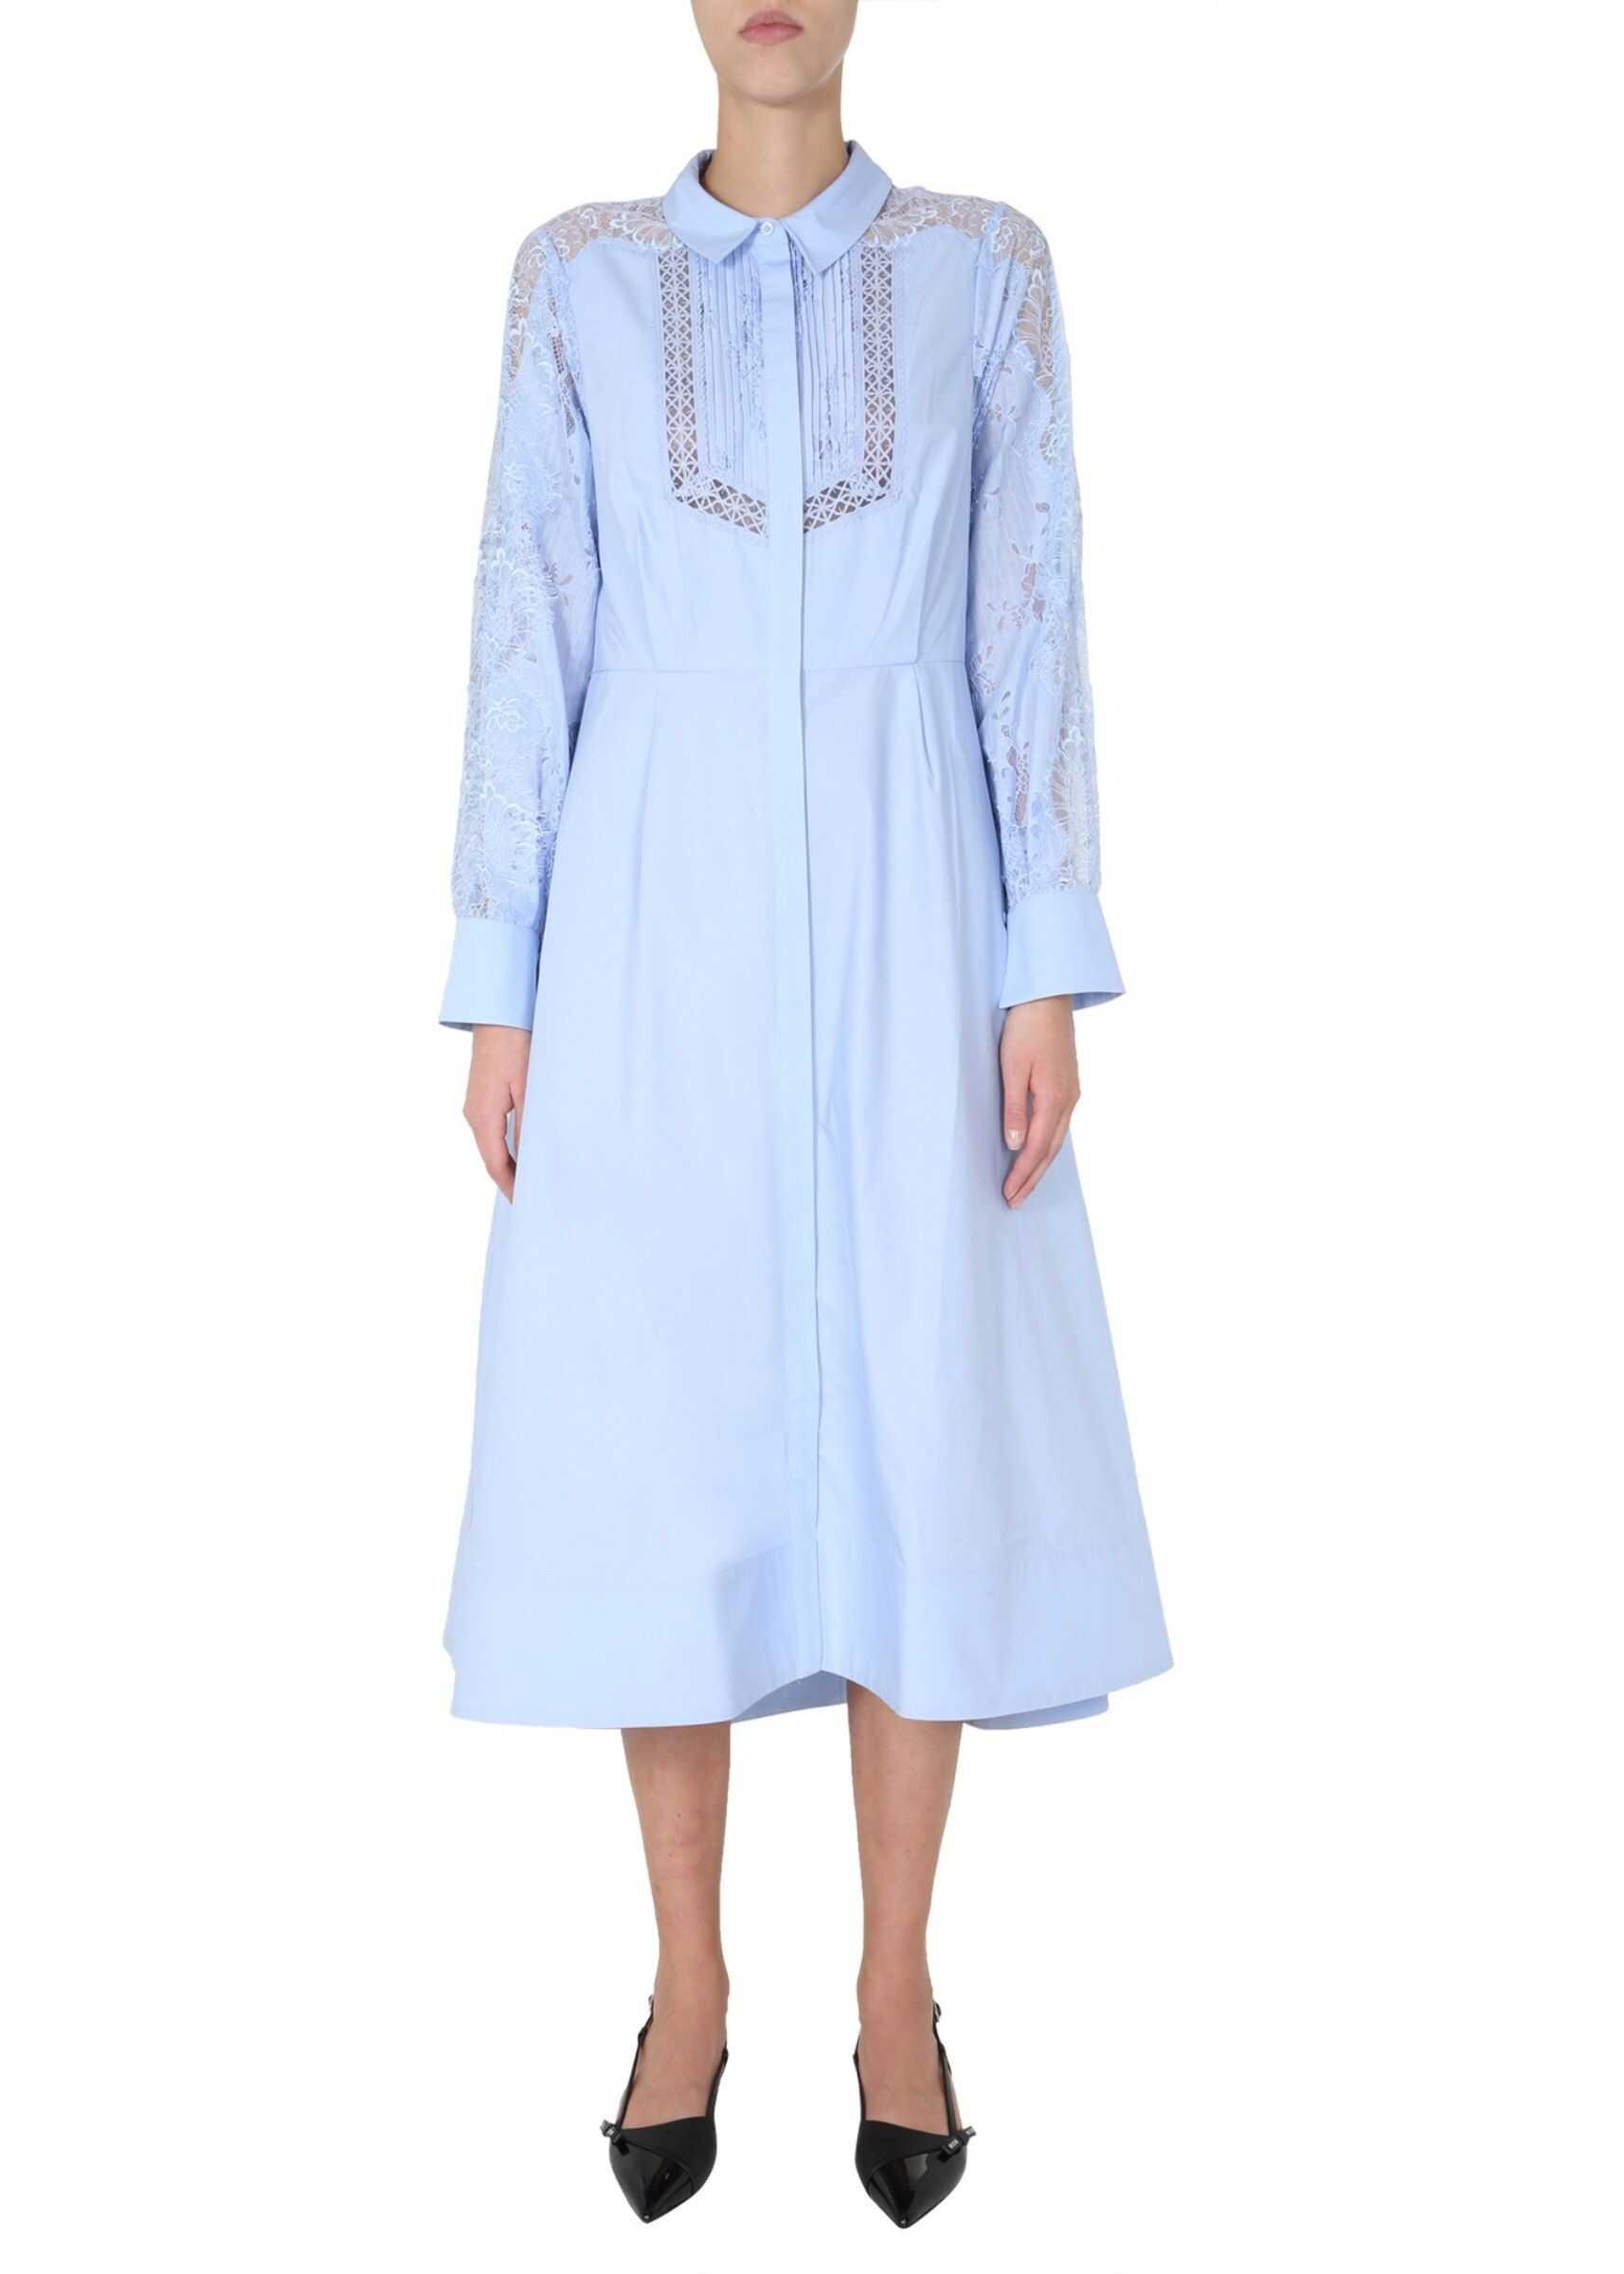 Self-Portrait Shirt Dress BABY BLUE